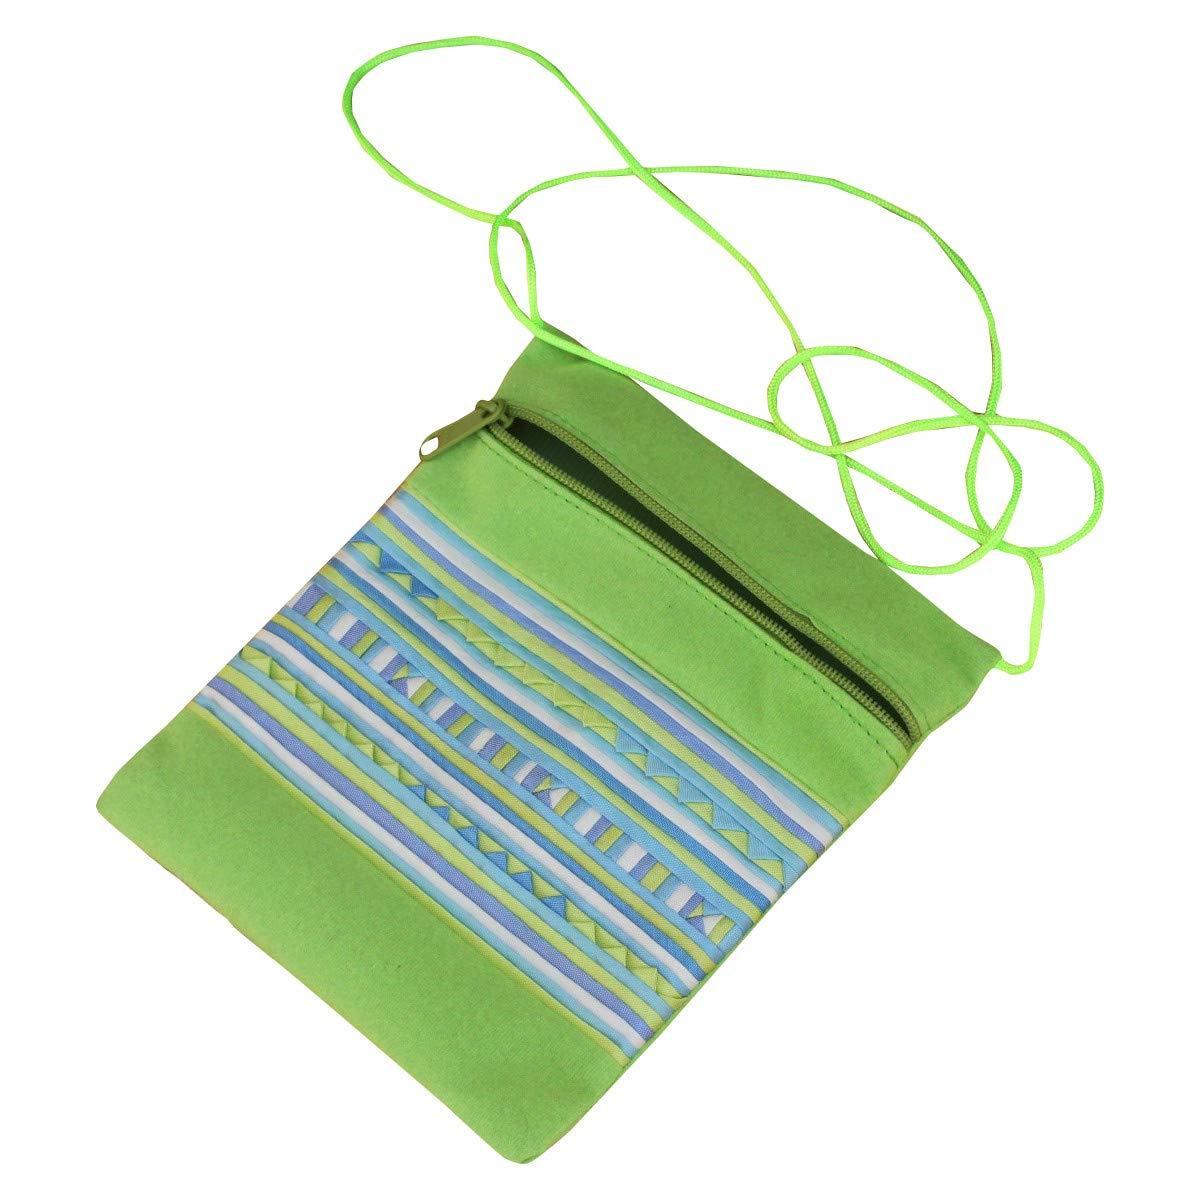 RaanPahMuang Small Lahu Green Travel Pouch FairTrade Textured Blue Green Pattern